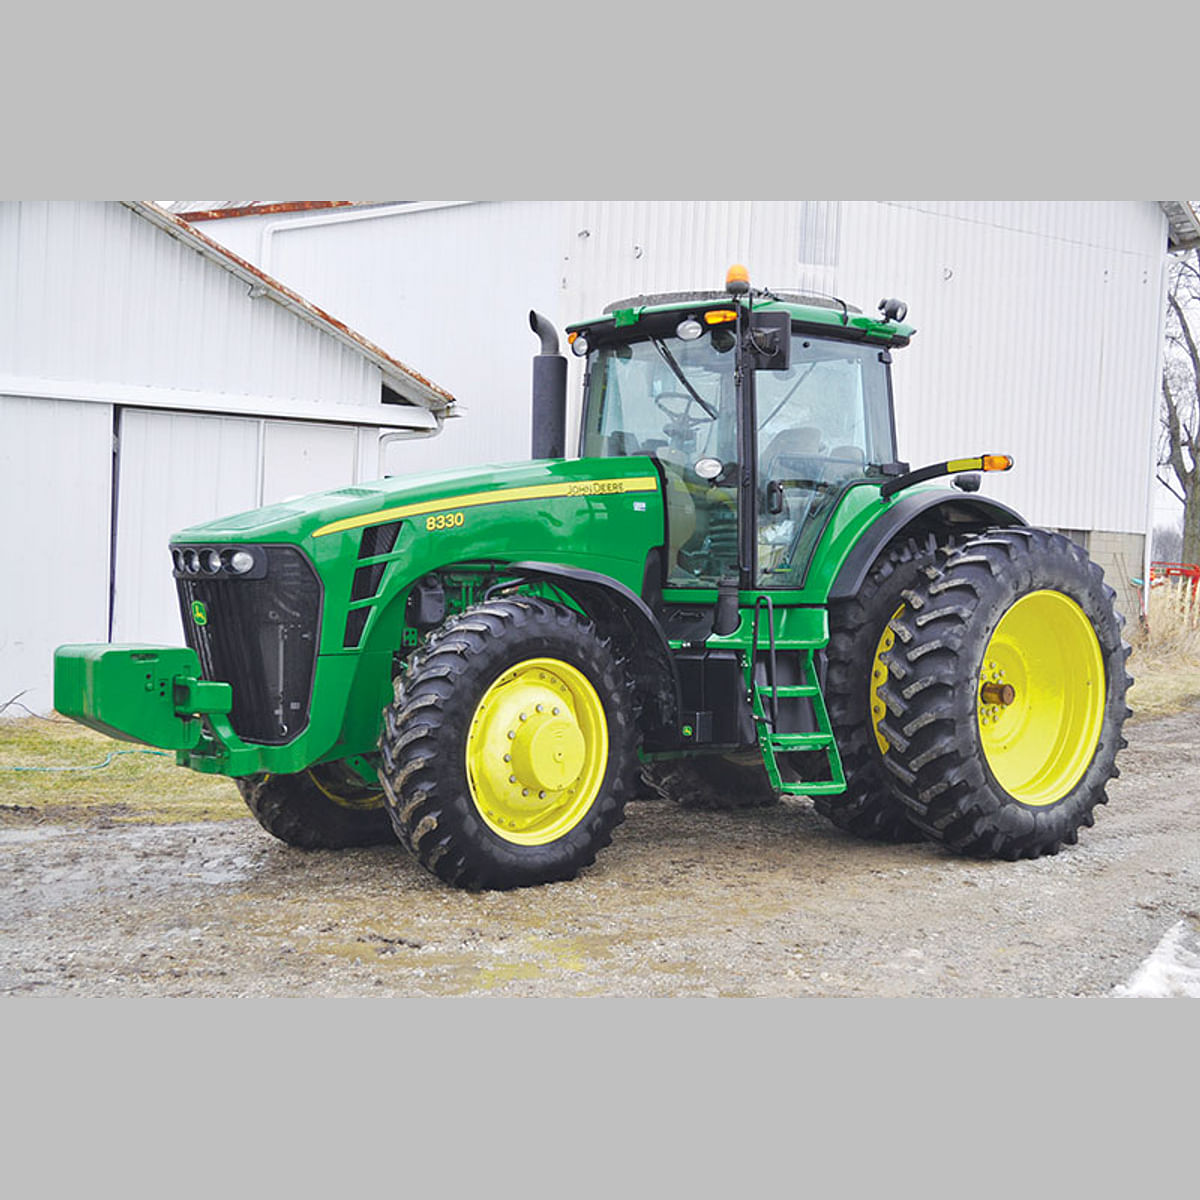 Dennis Farms Equipment Auction | The Wendt Group, Inc